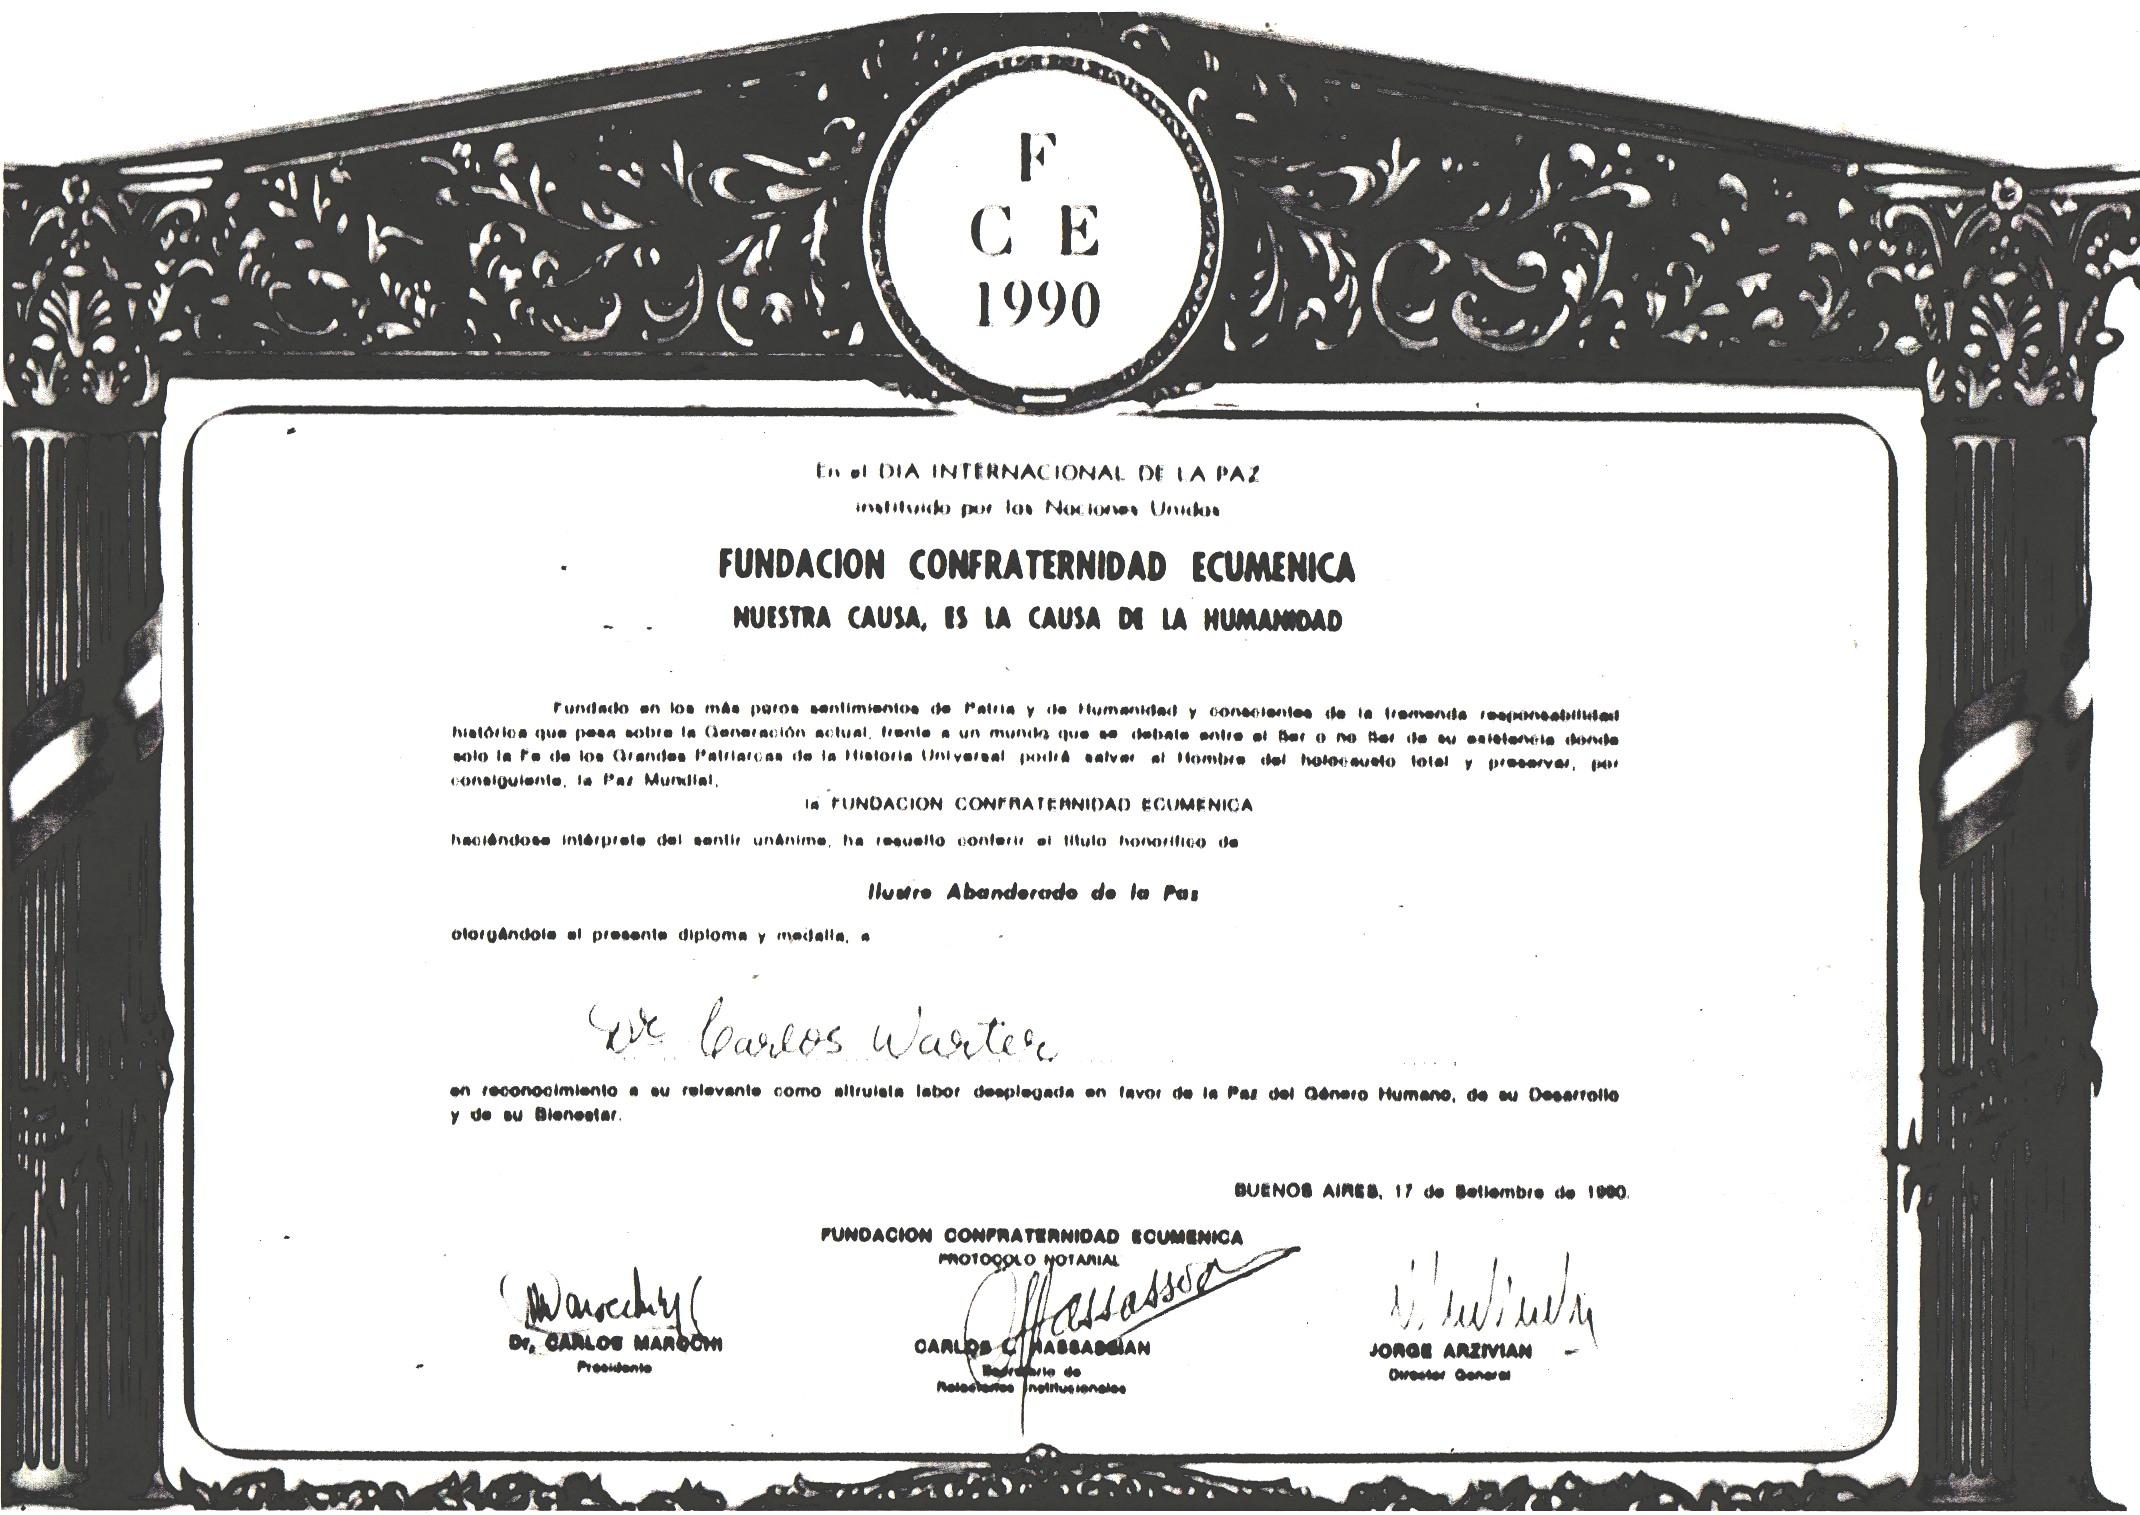 FUnd Ecumenica026.jpg